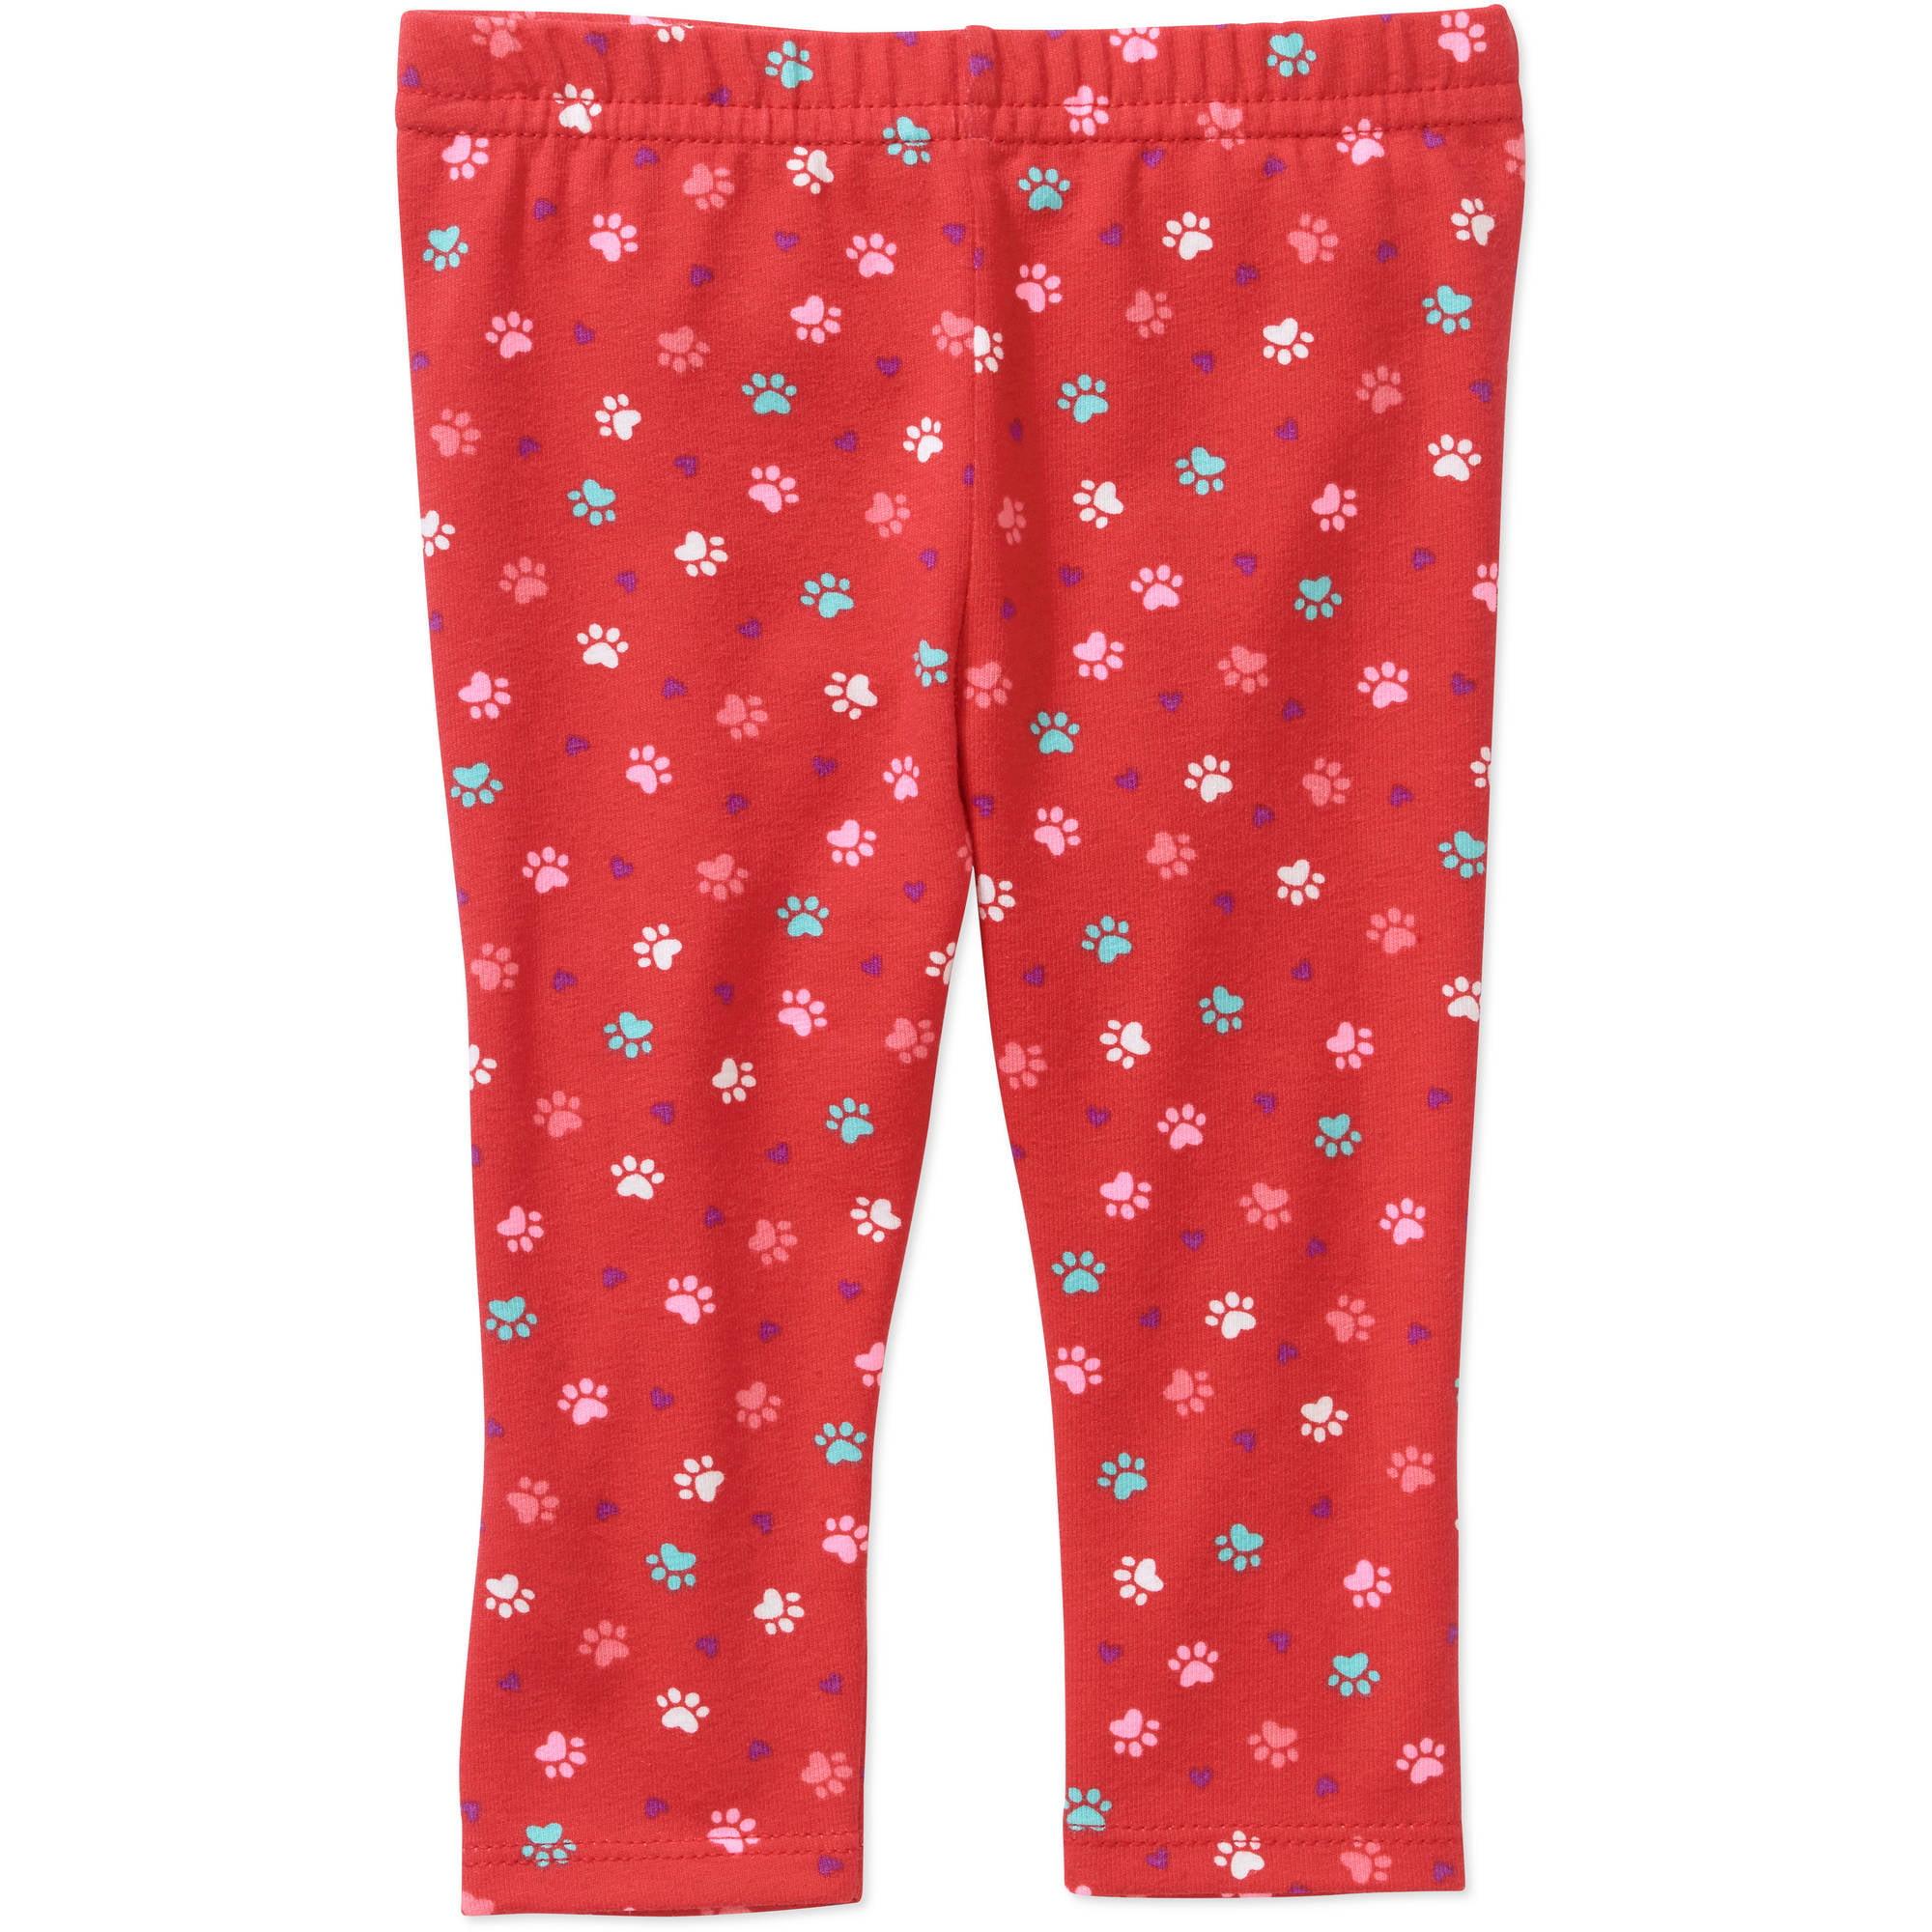 Garanimals Newborn Baby Girls' Print Knit Leggings